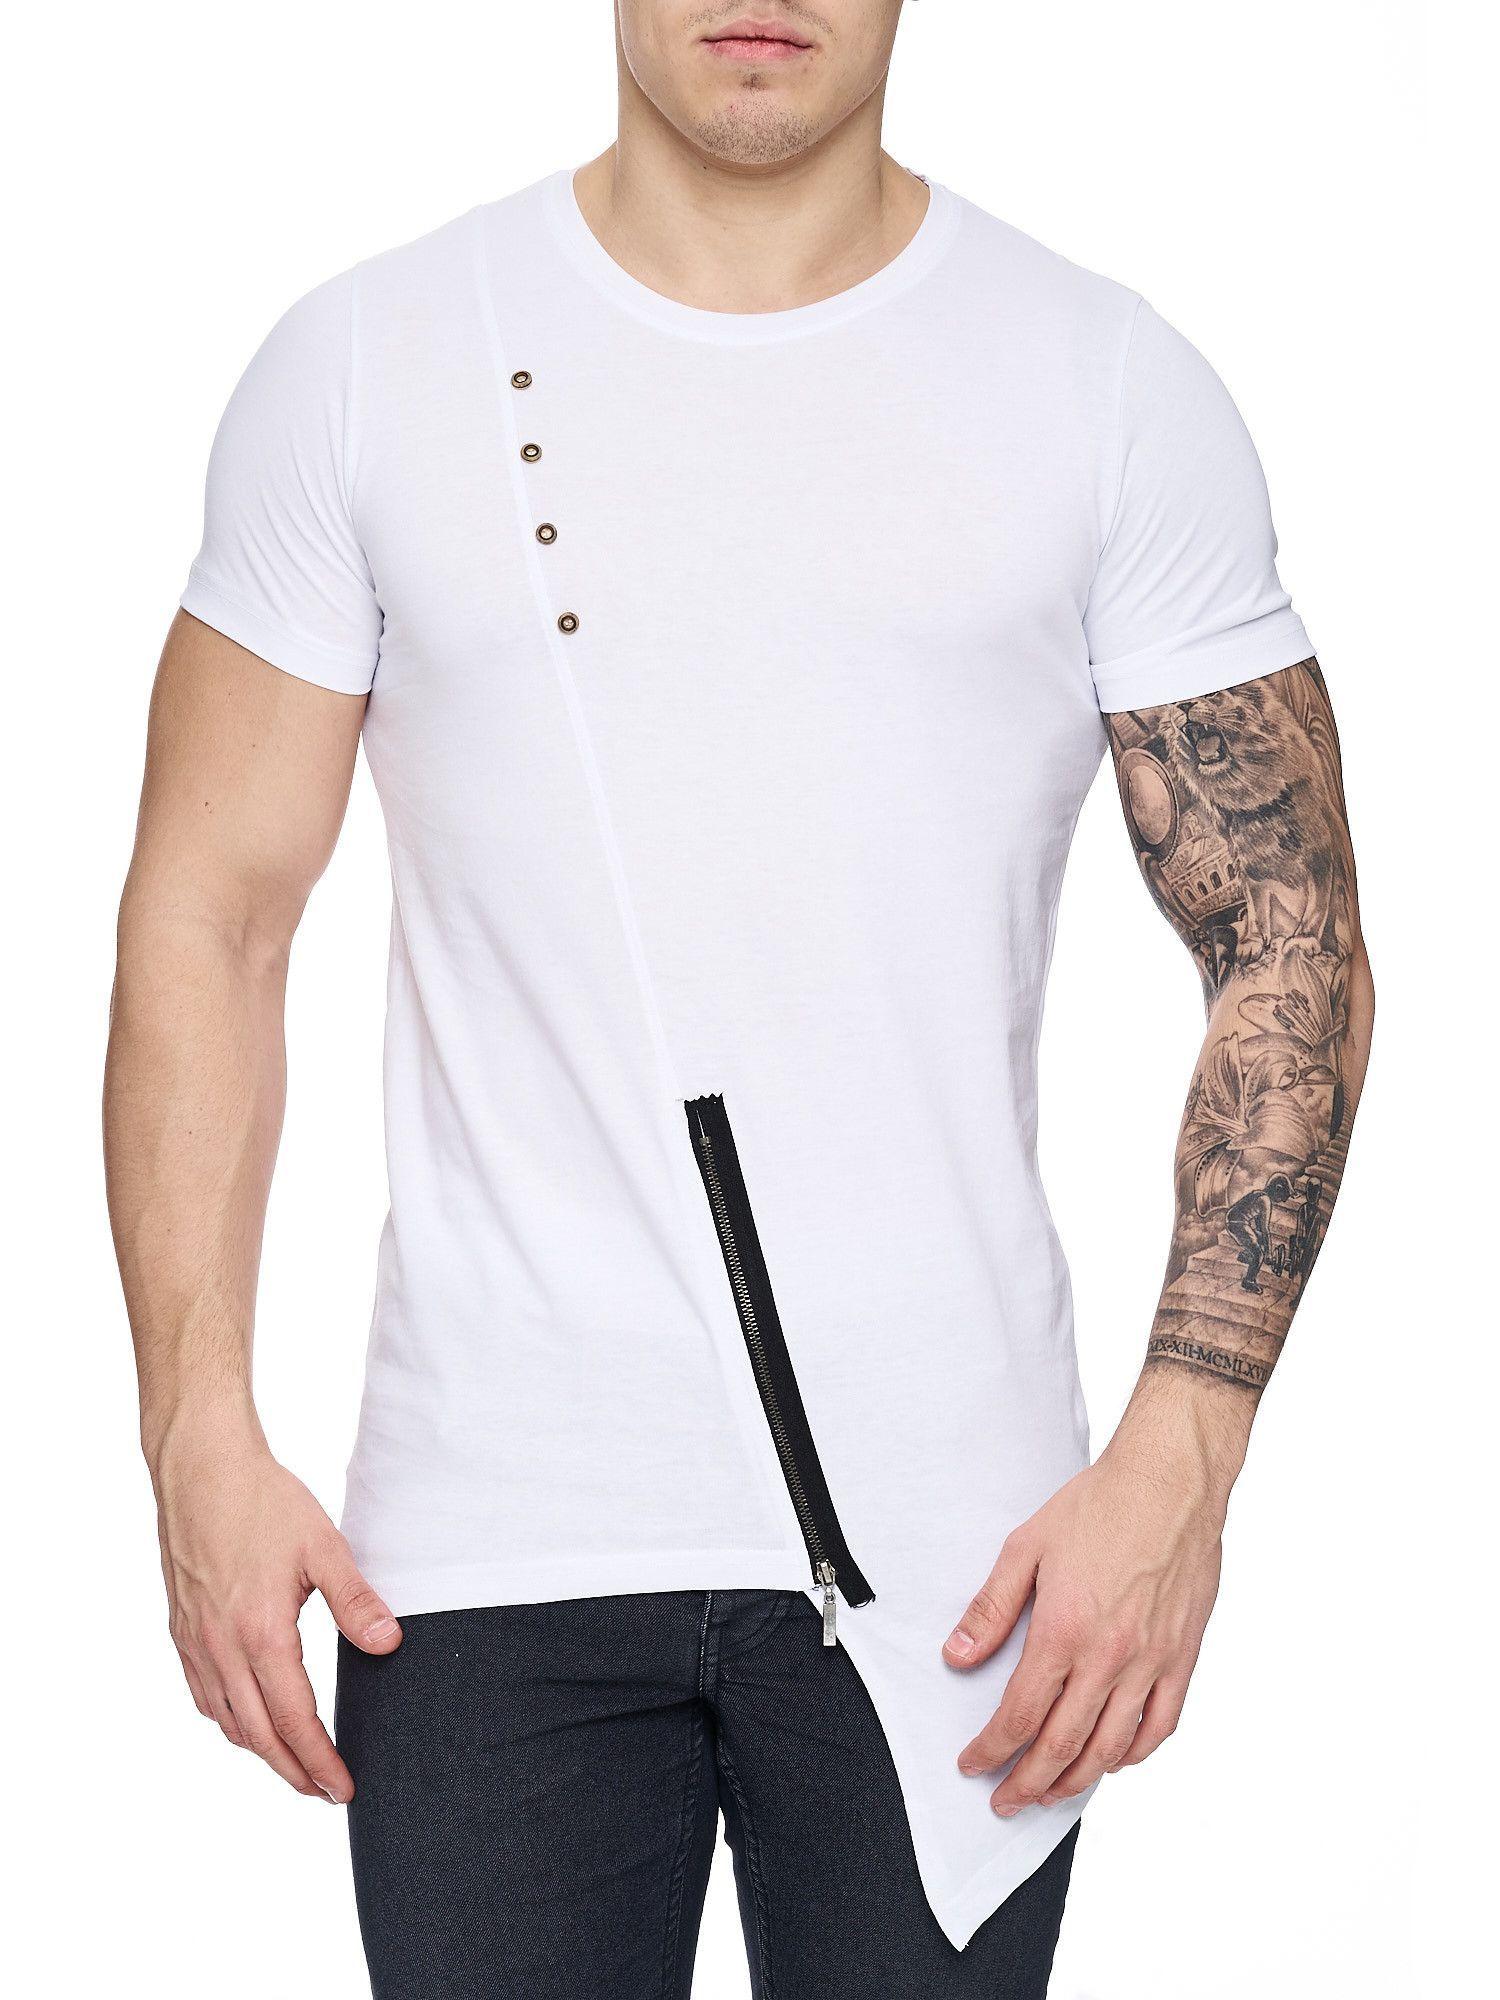 4992d0c024f0f5 K D Men Asymmetrical Zipper Long T-shirt - White